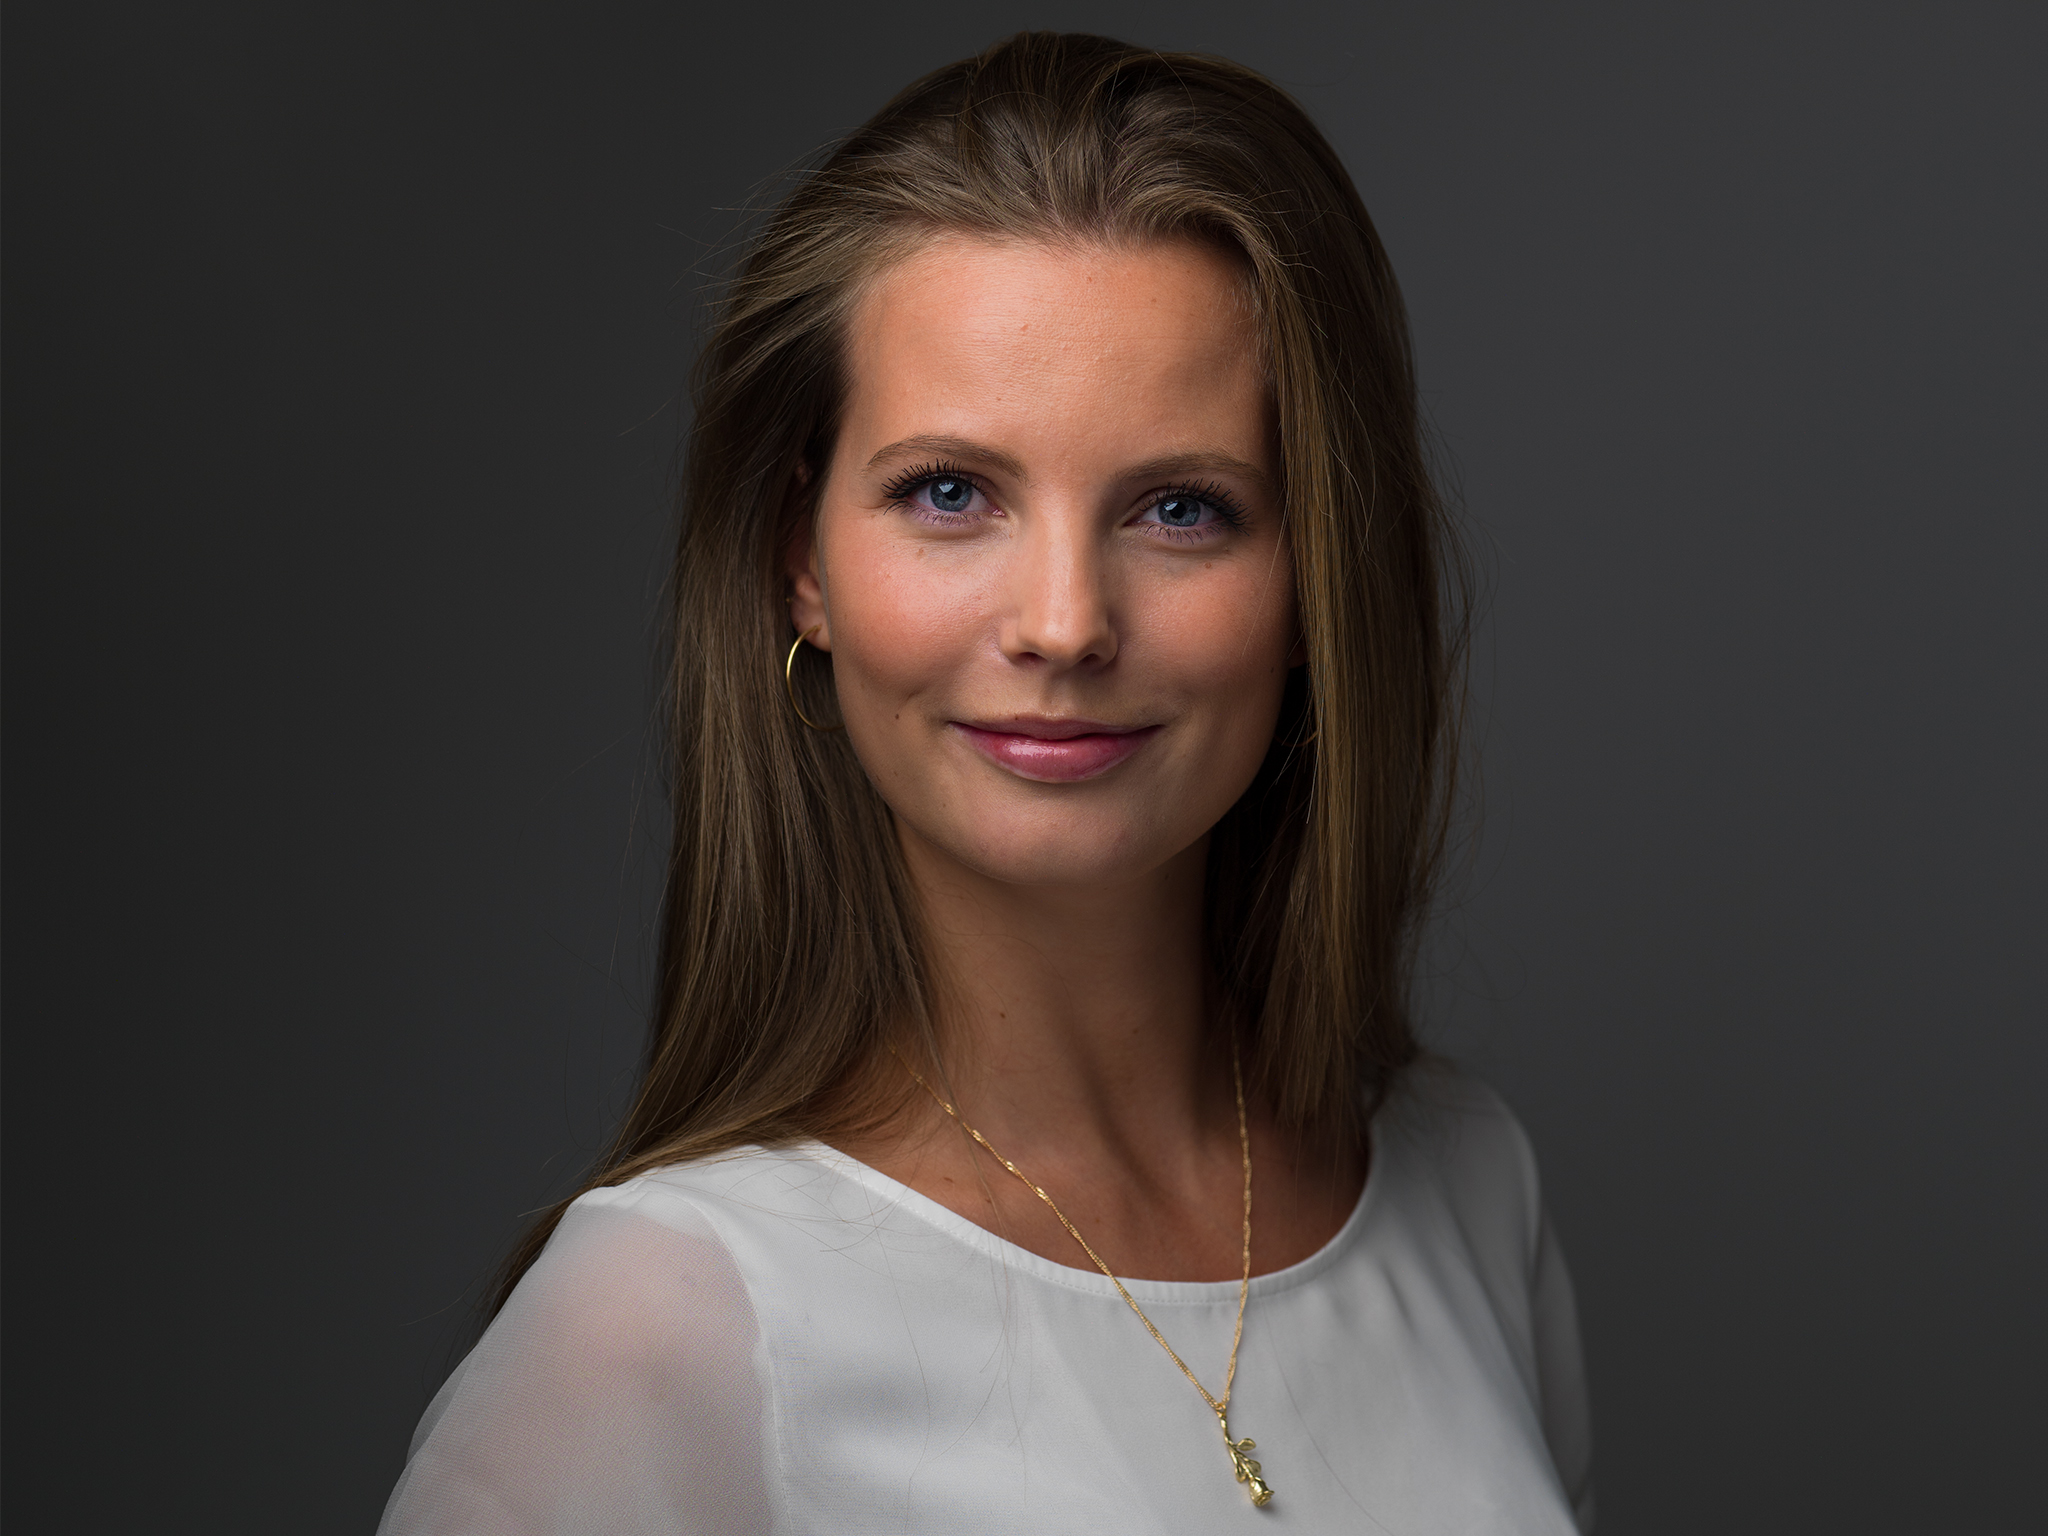 Anja Stjernebye - By Mads M Madsen.jpg